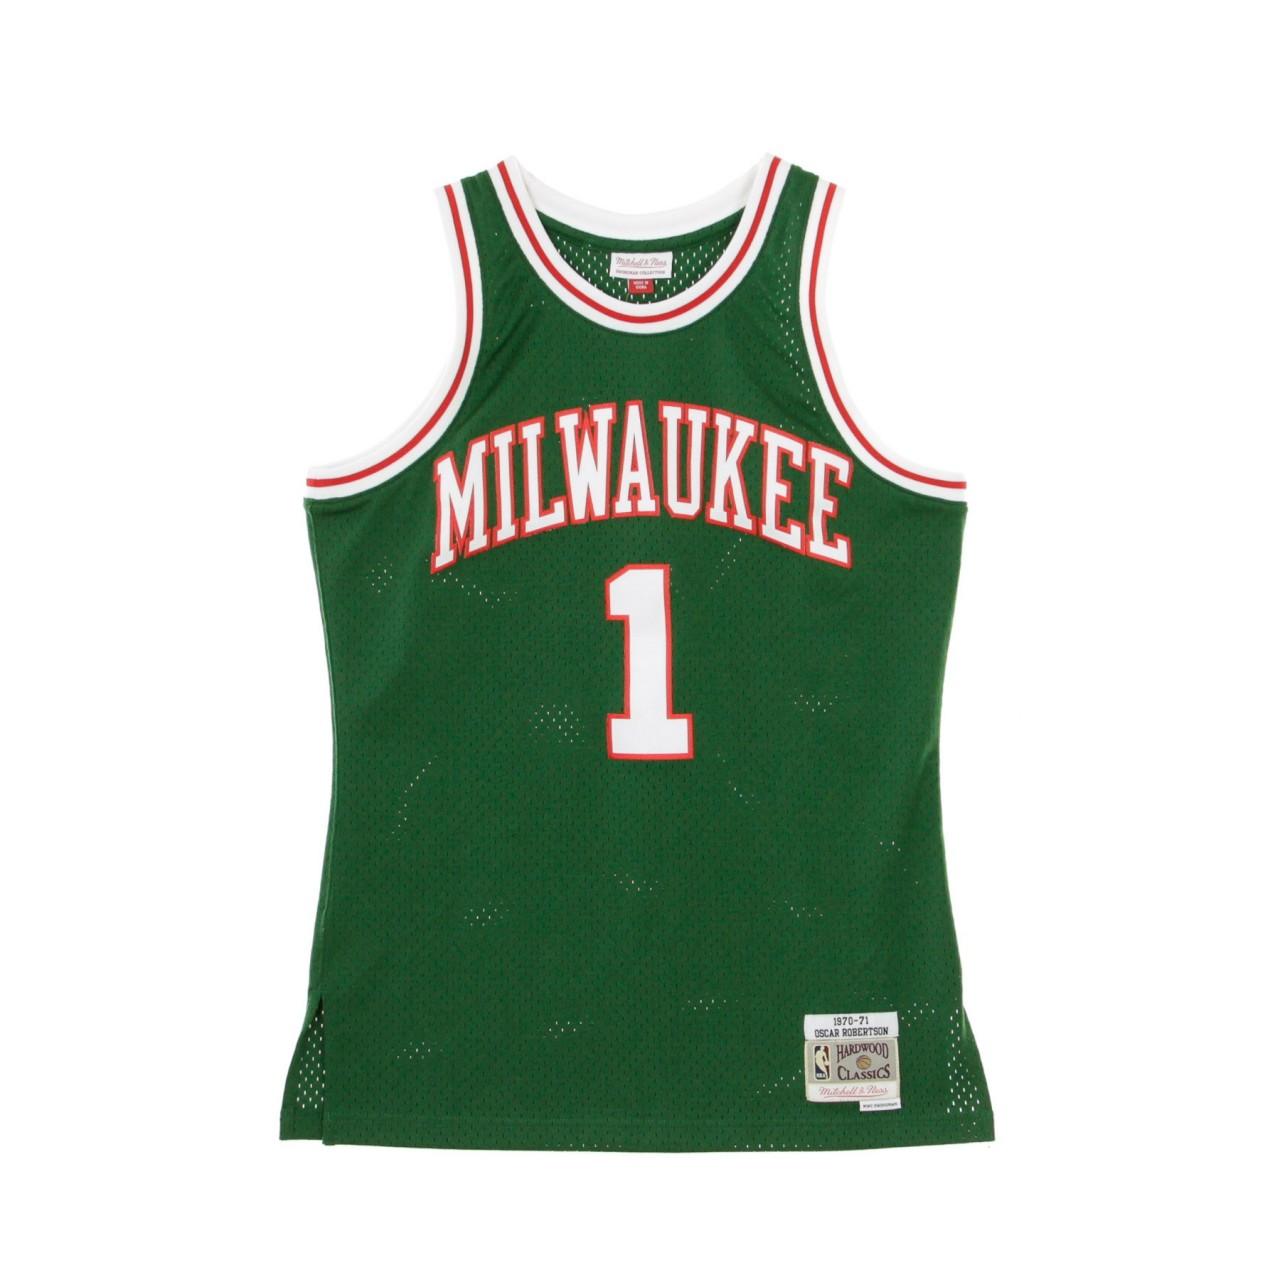 MITCHELL & NESS NBA SWINGMAN JERSEY OSCAR ROBERTSON NO.1 1970/71 MILBUC 111111 JERSEY MILBUC